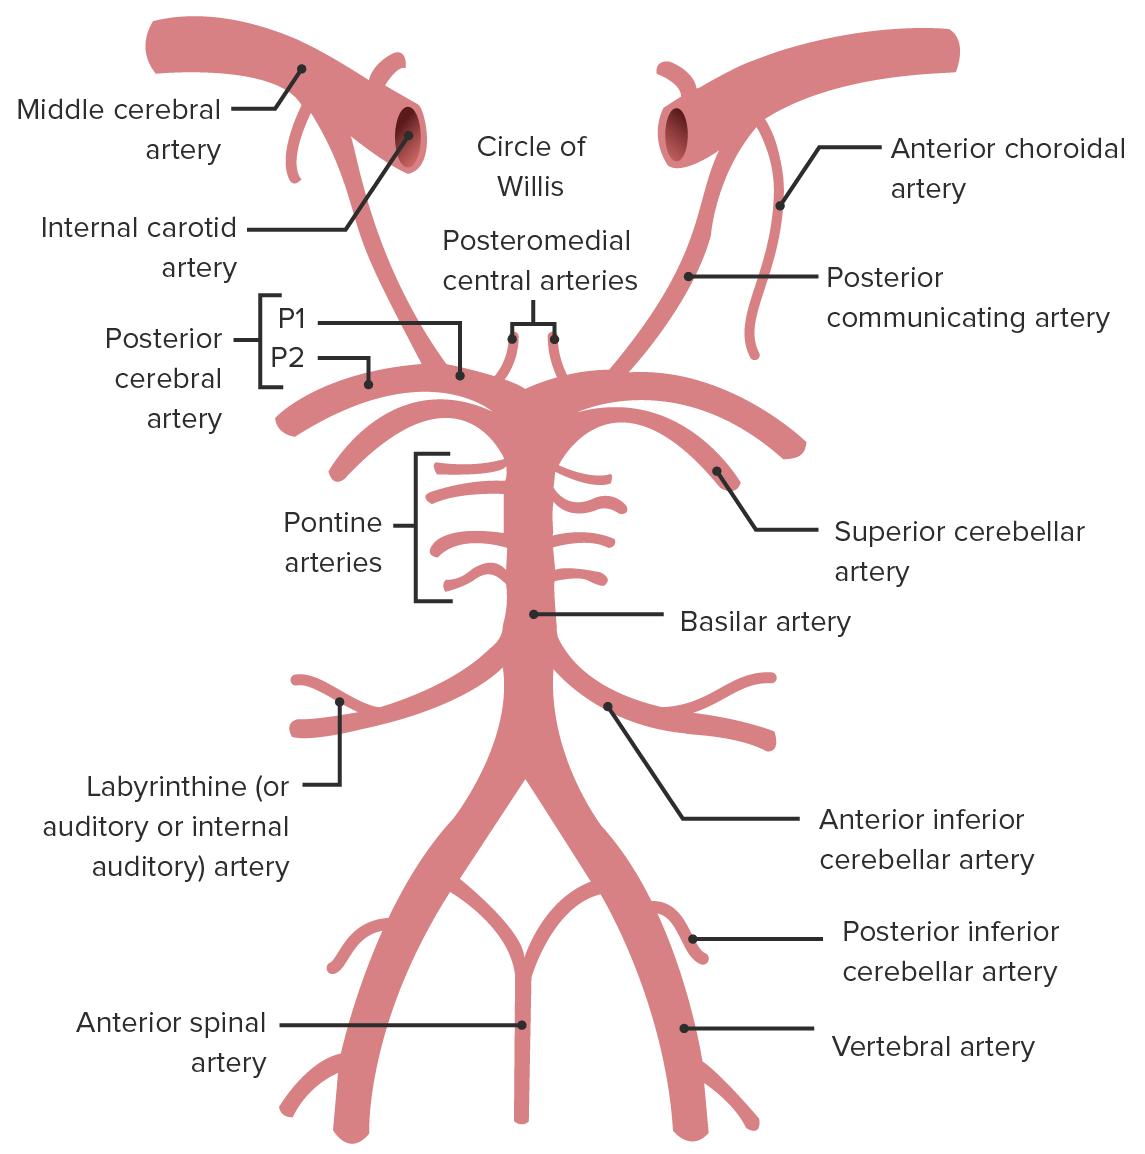 Posterior inferior cerebellar artery (PICA)